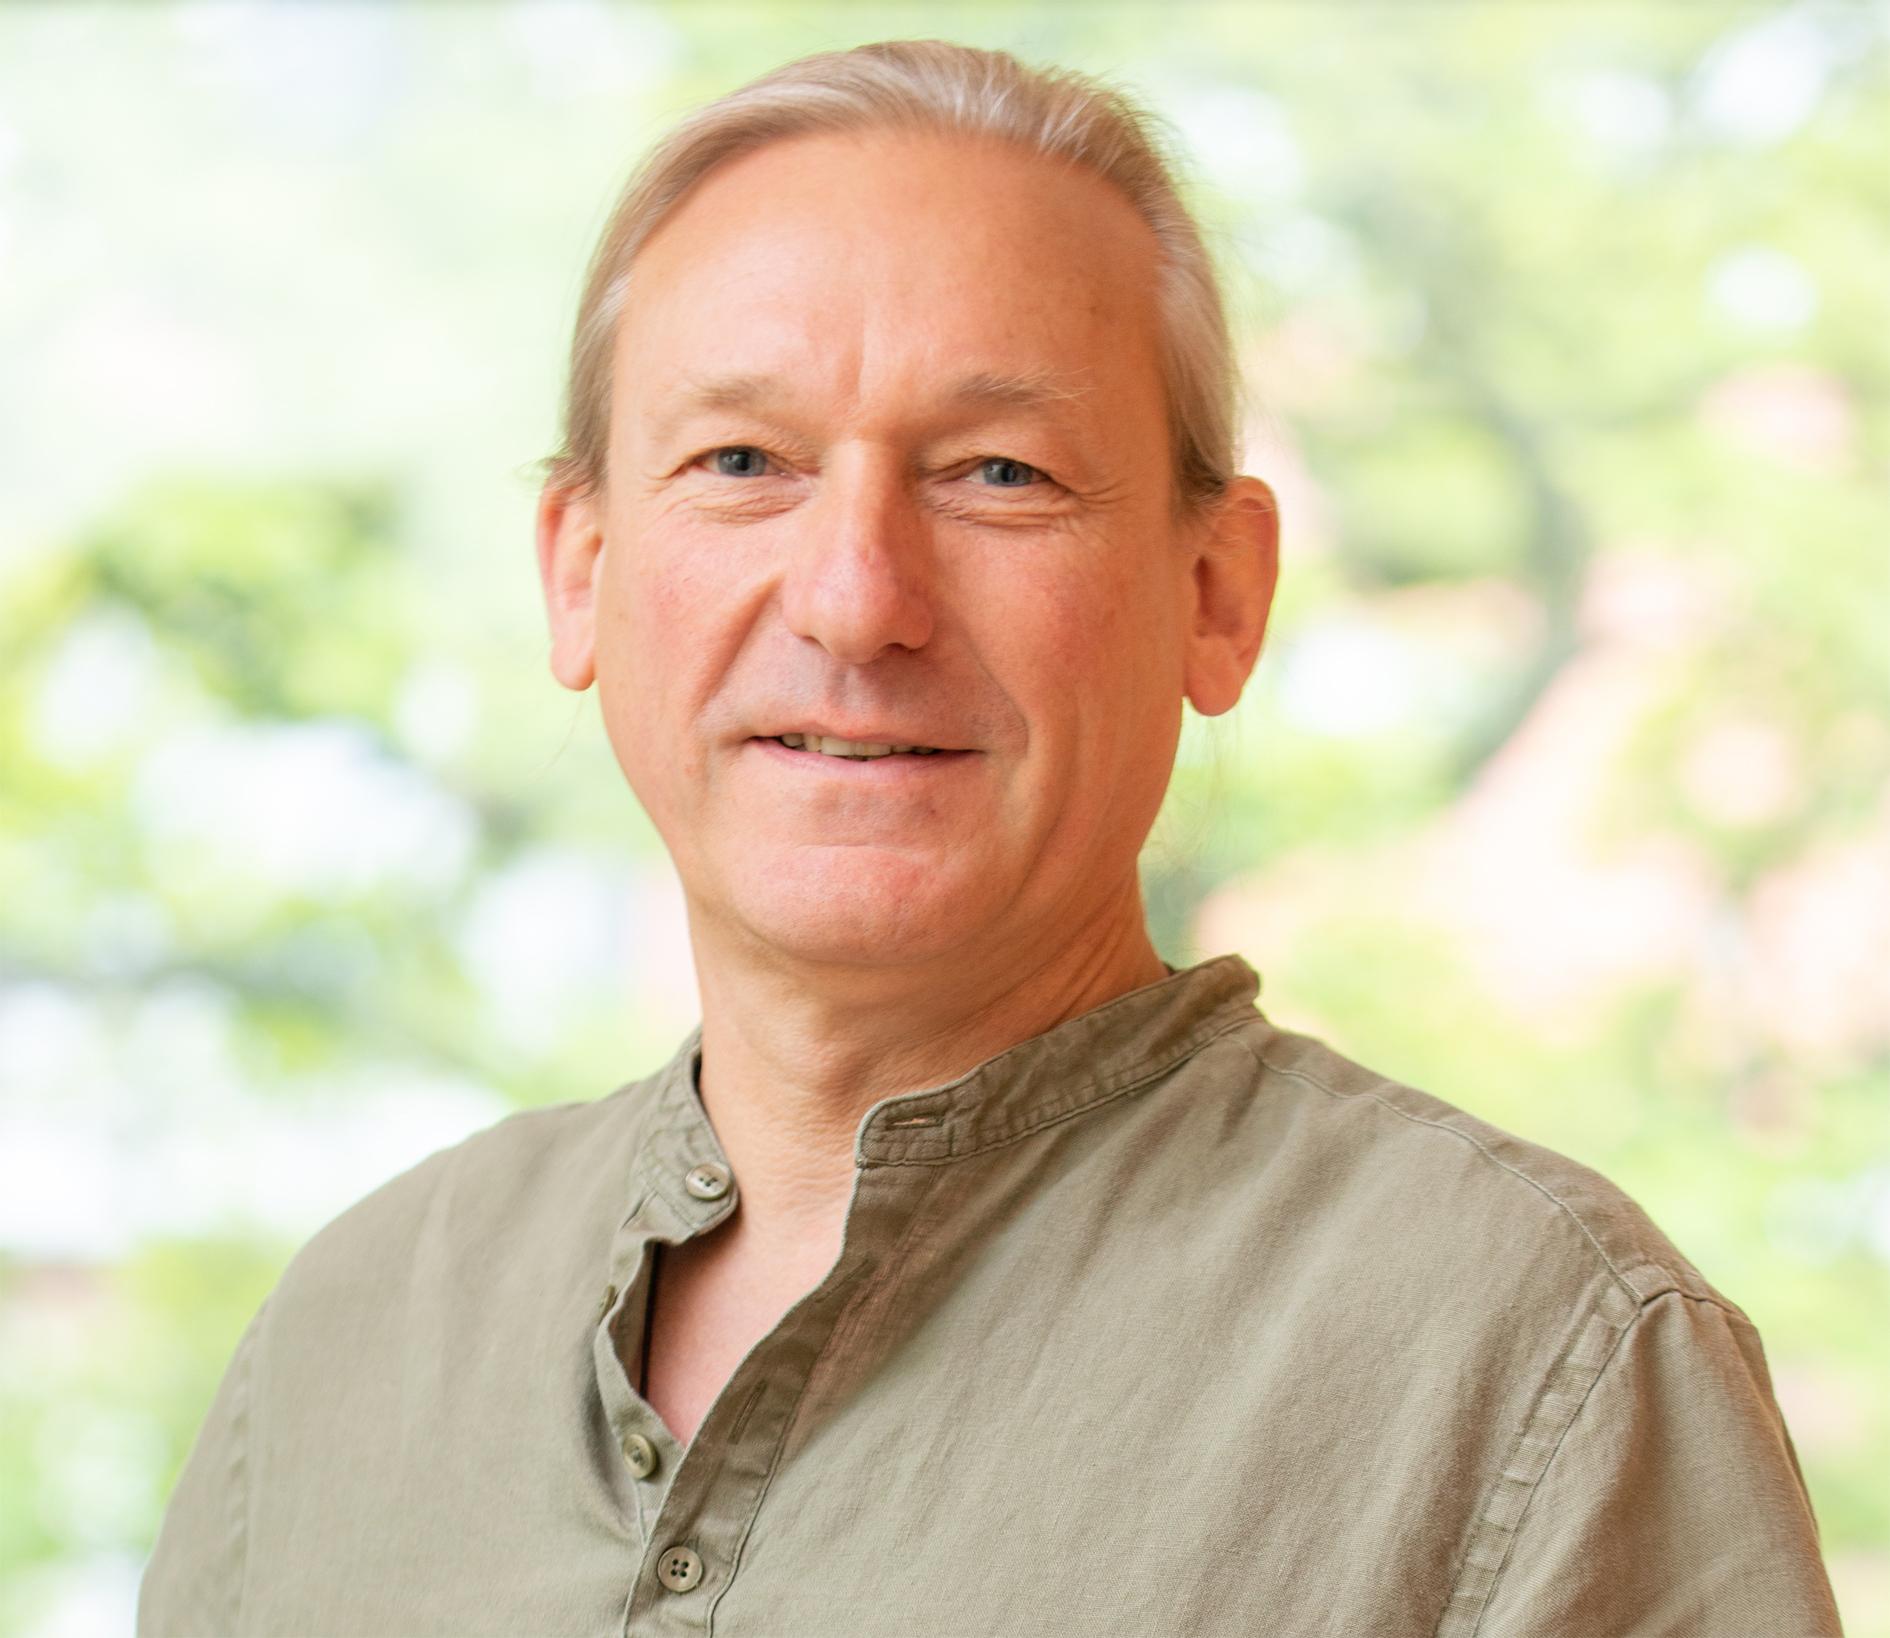 Patrick Defauw